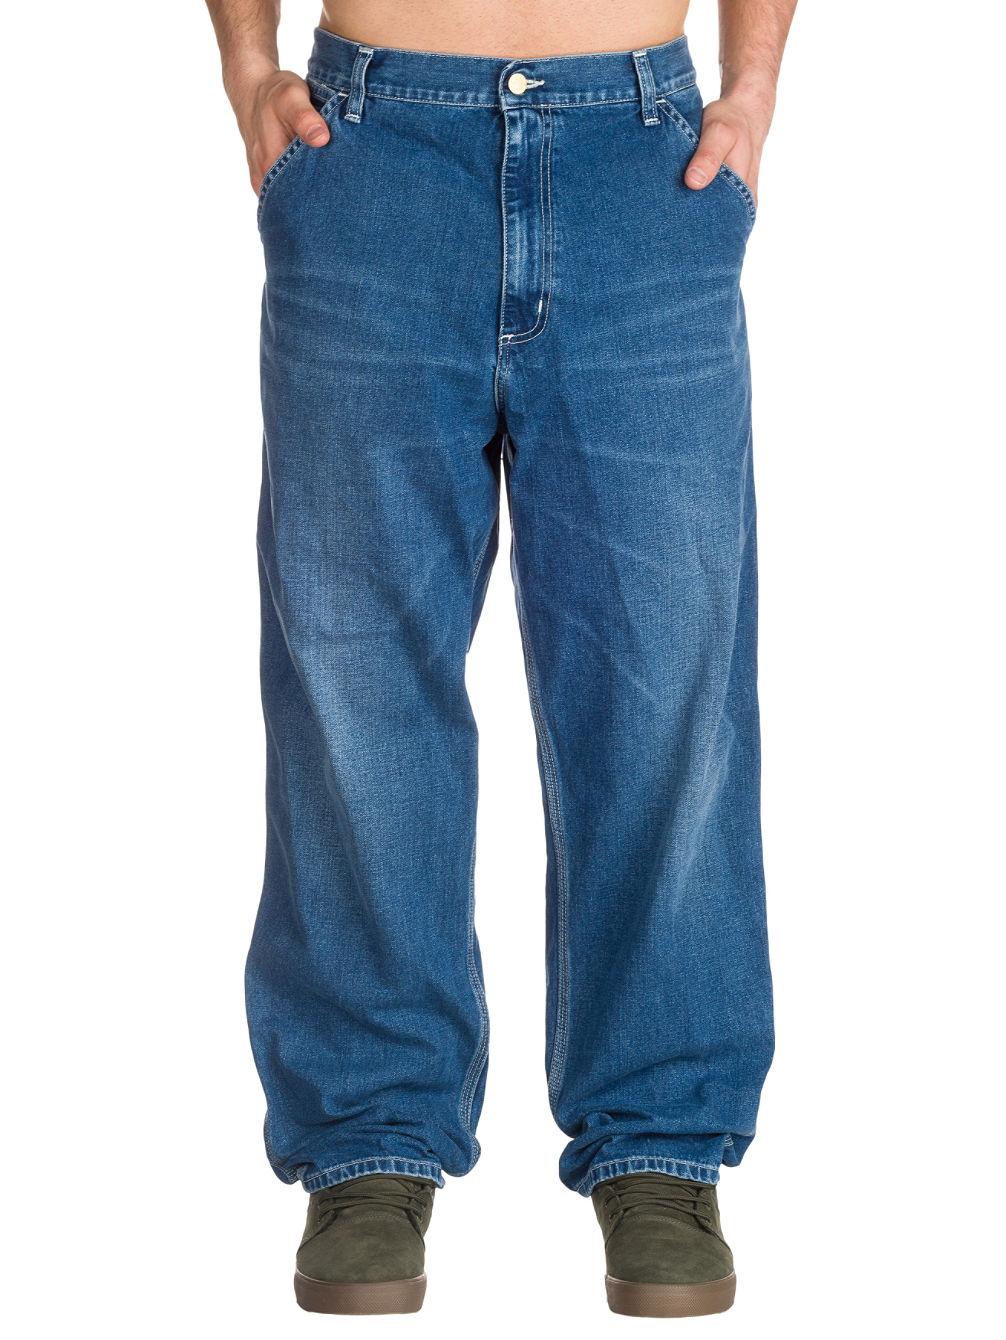 2b72dd56557 Buy Carhartt WIP Simple Pants online at Blue Tomato